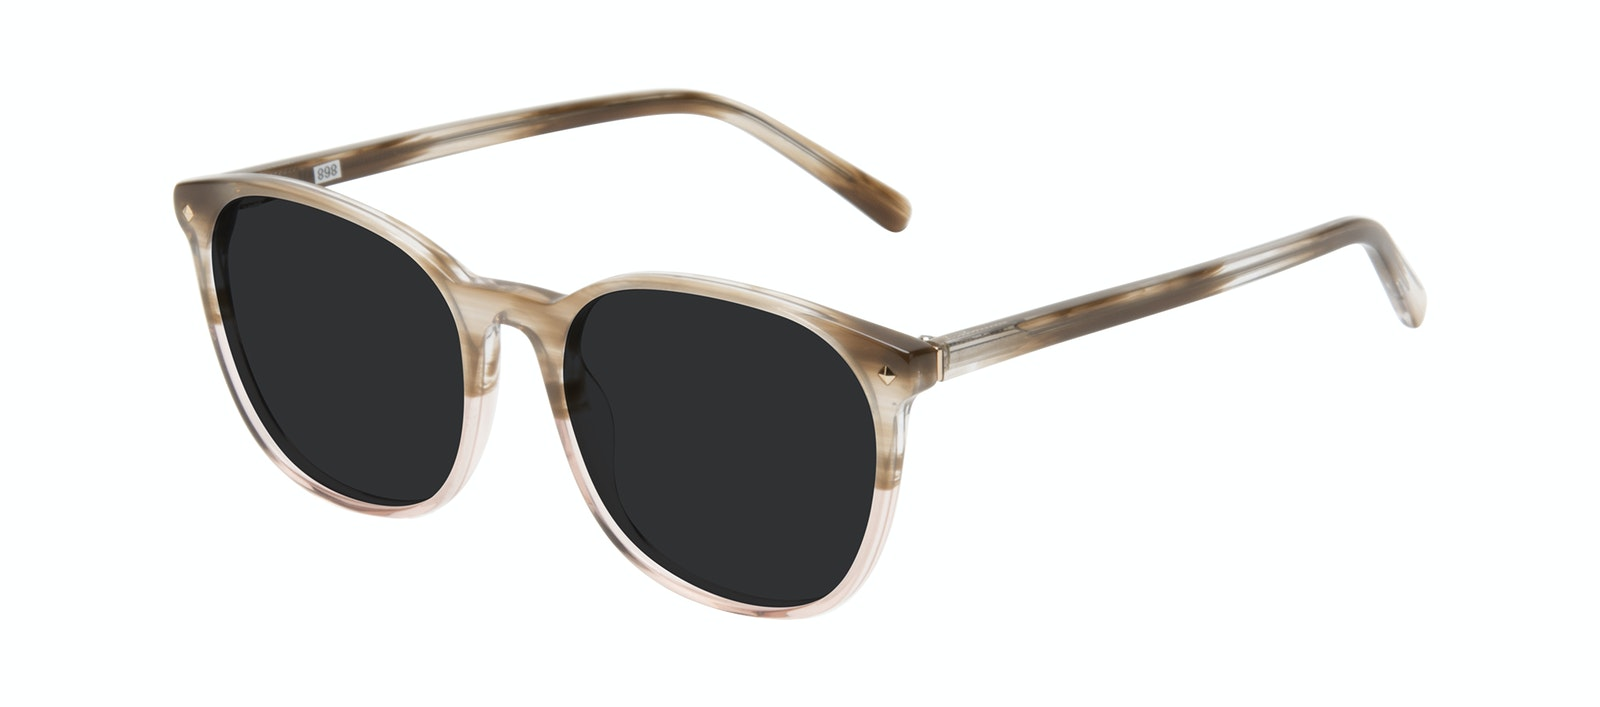 Affordable Fashion Glasses Round Sunglasses Women Revive Rosewood Tilt